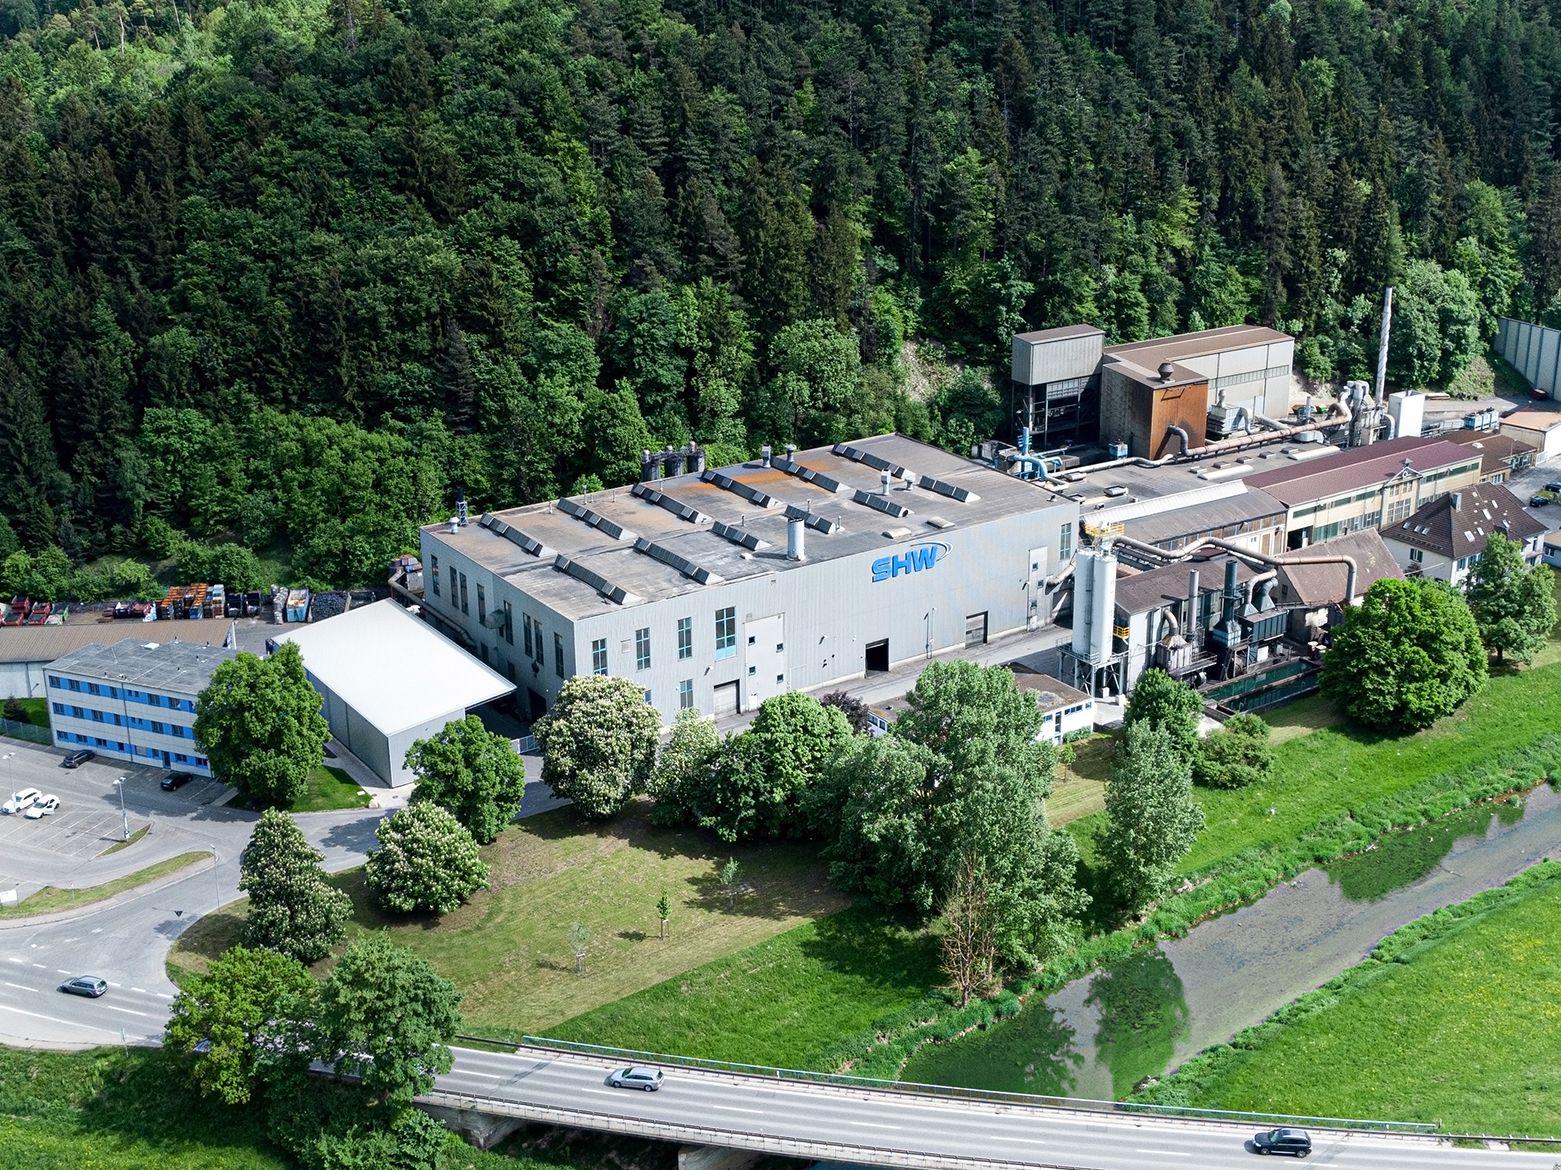 SHW Brake Systems GmbH / SHW Gießerei GmbH & Co. KG